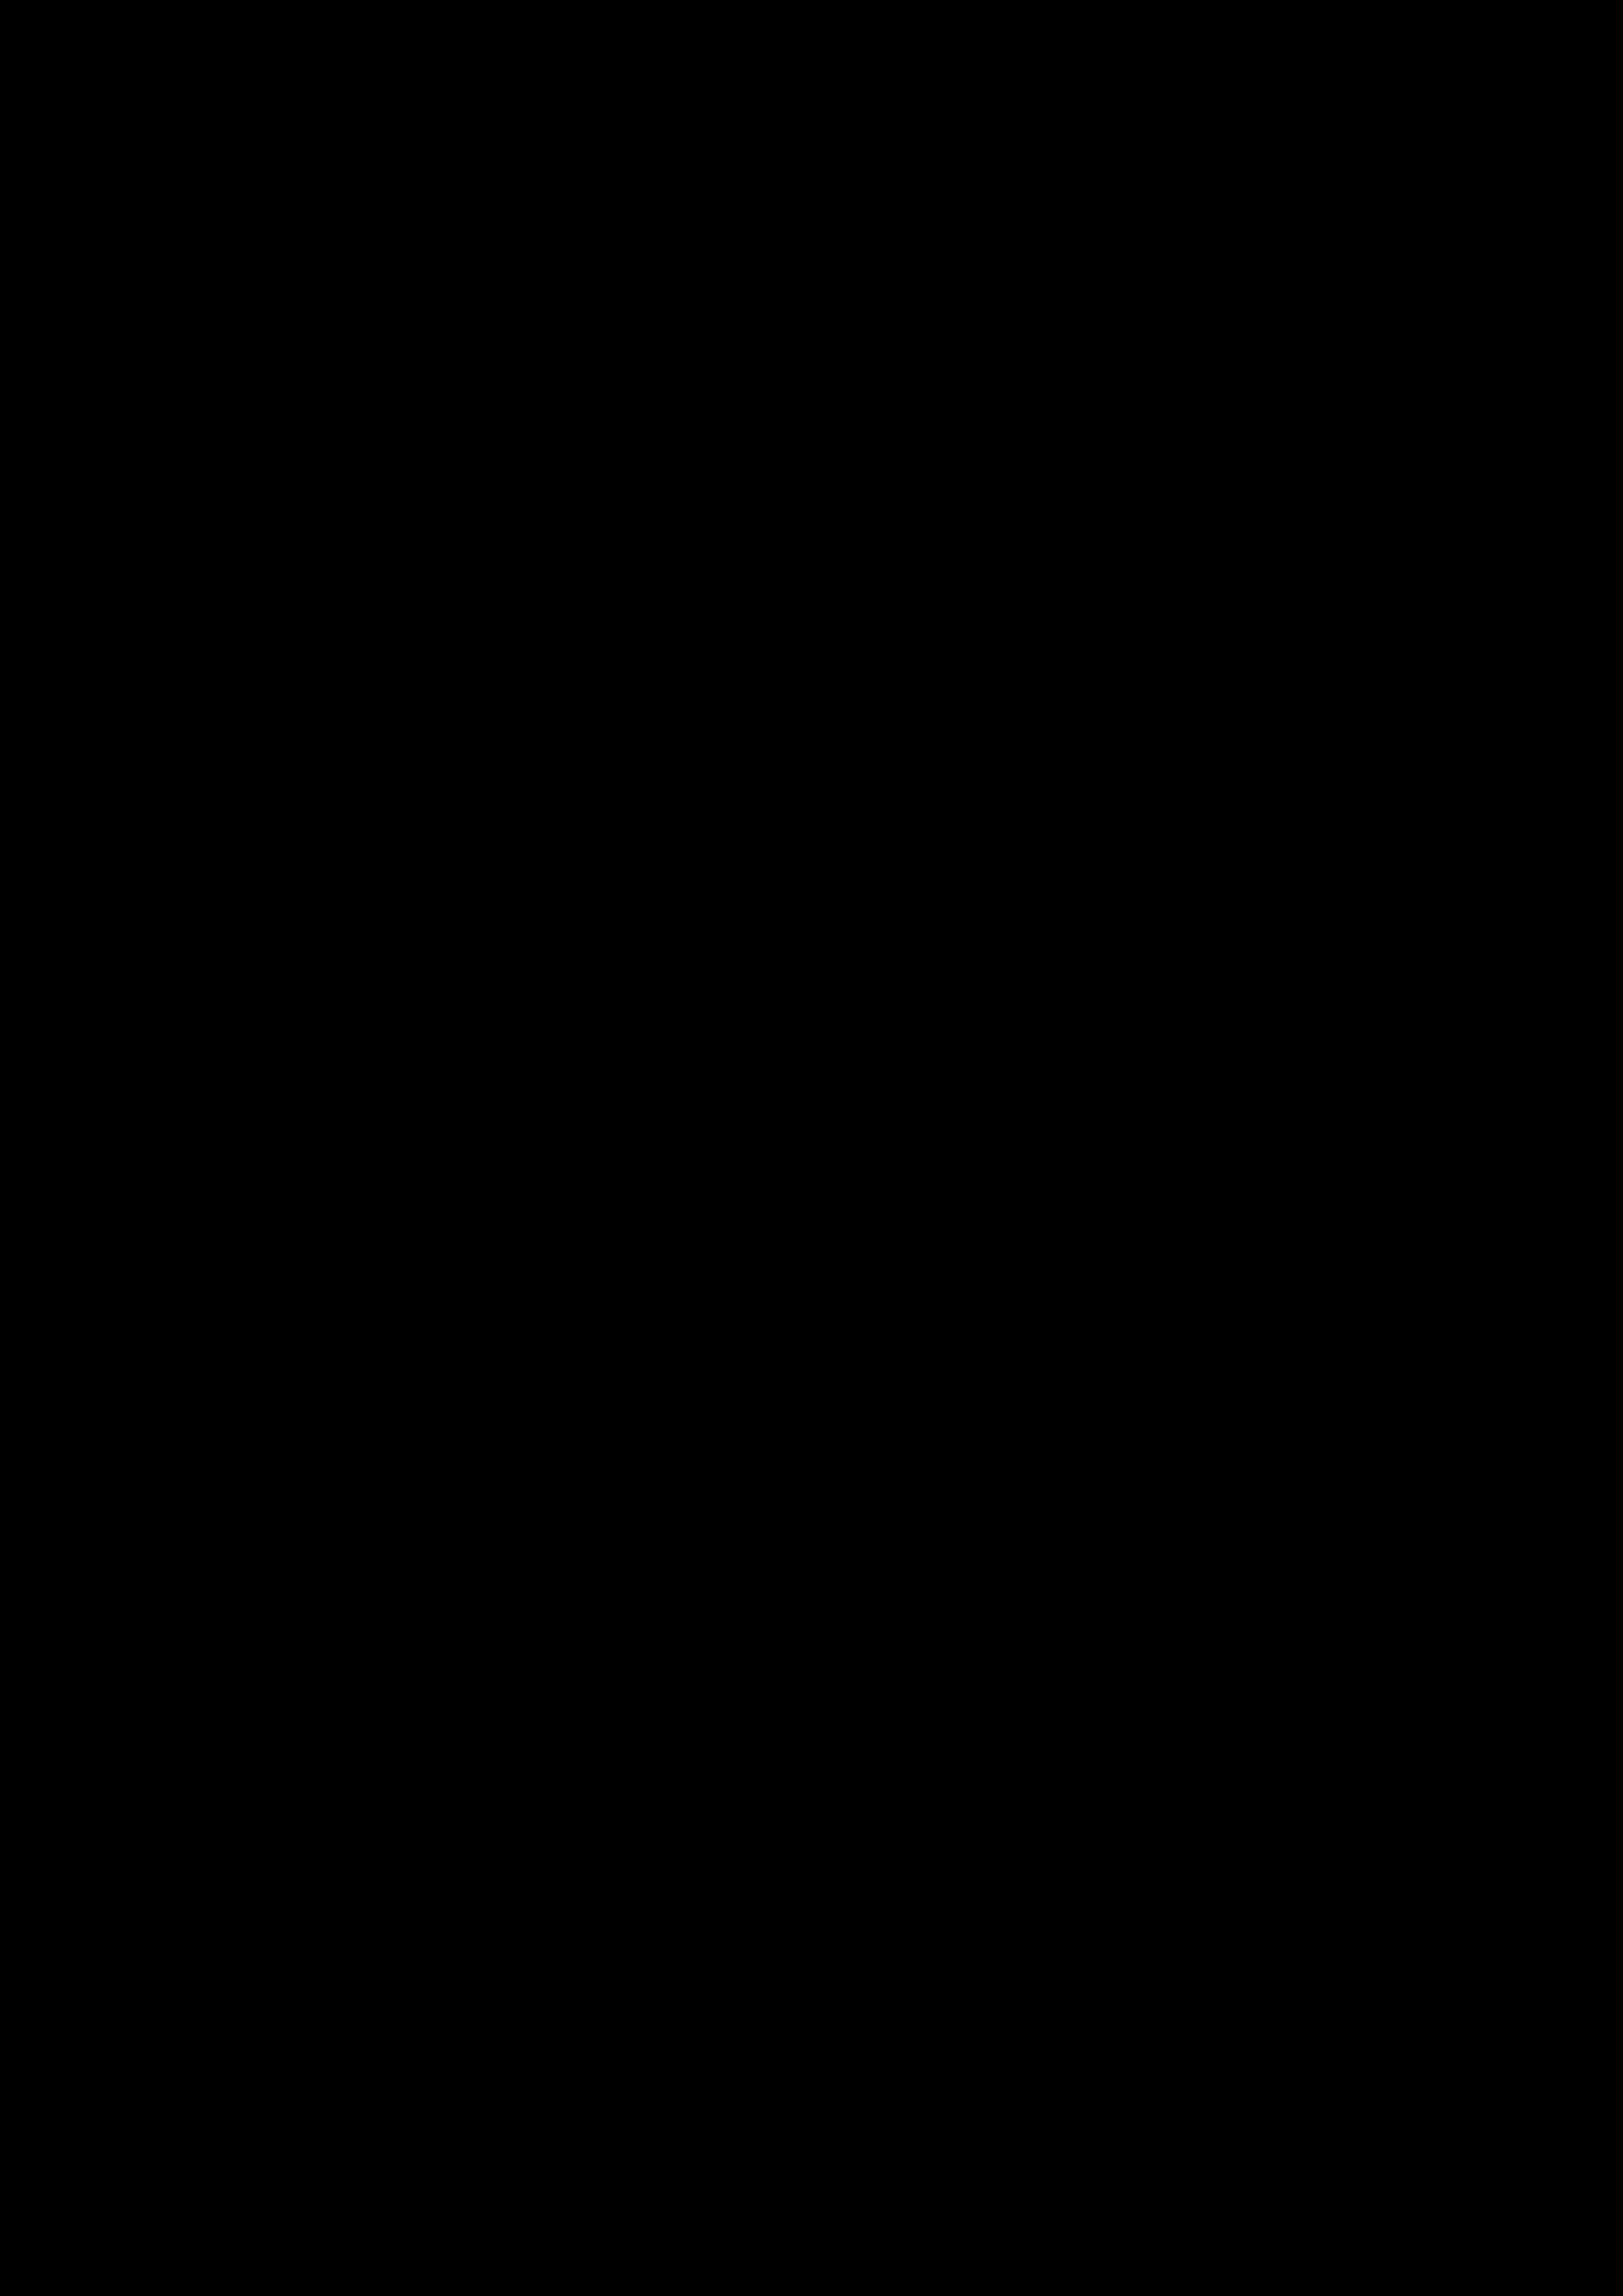 espanacircular2030_def1_tcm30-509532-1